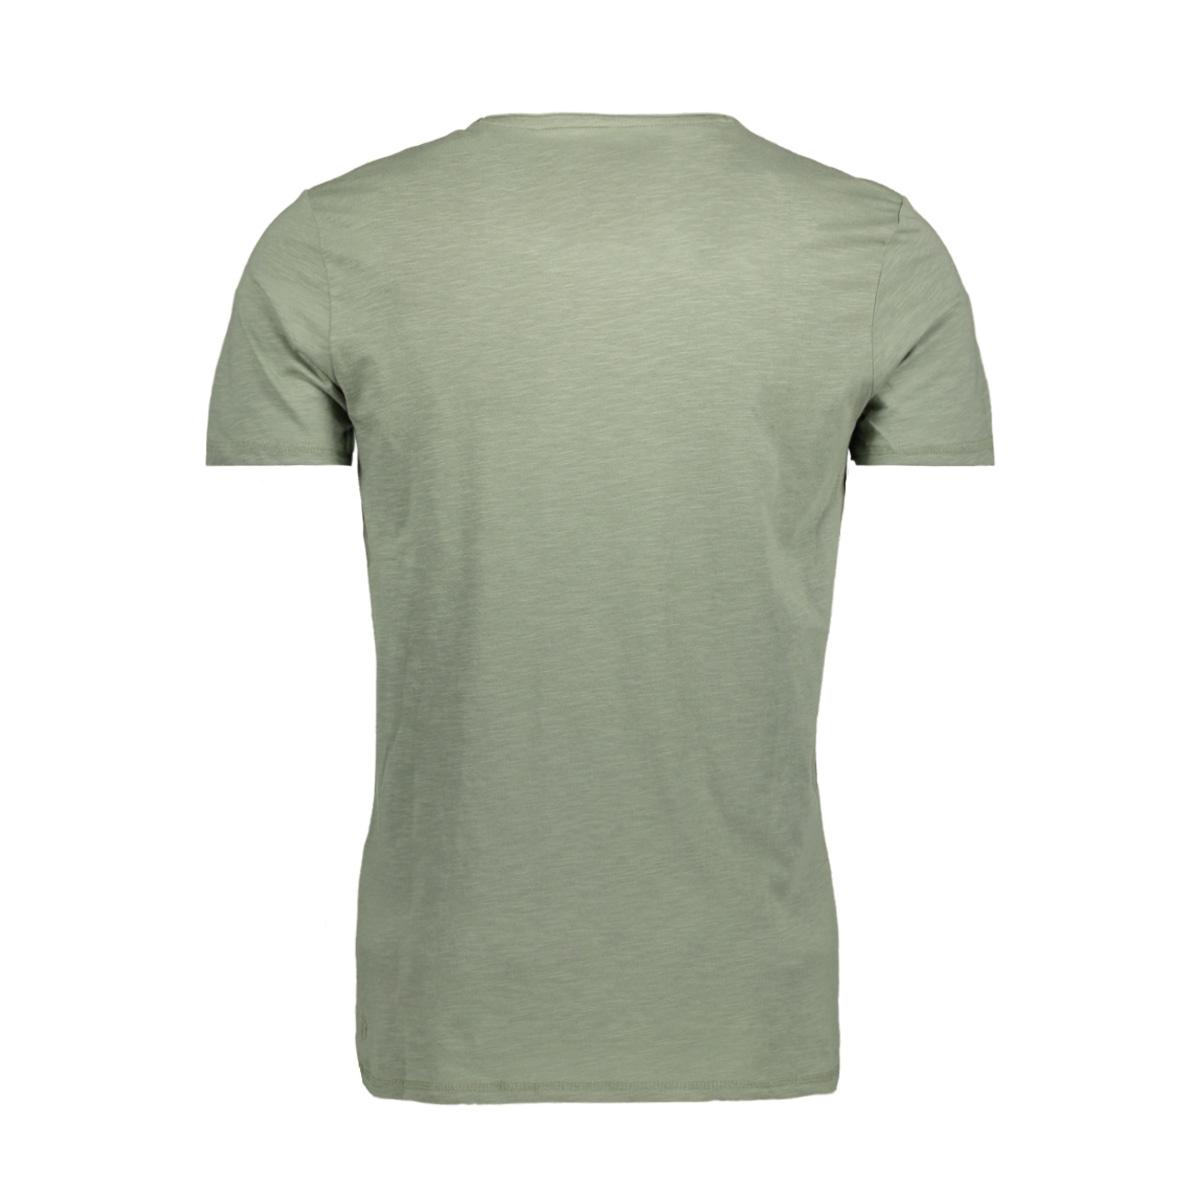 1055305.09.12 tom tailor t-shirt 7057